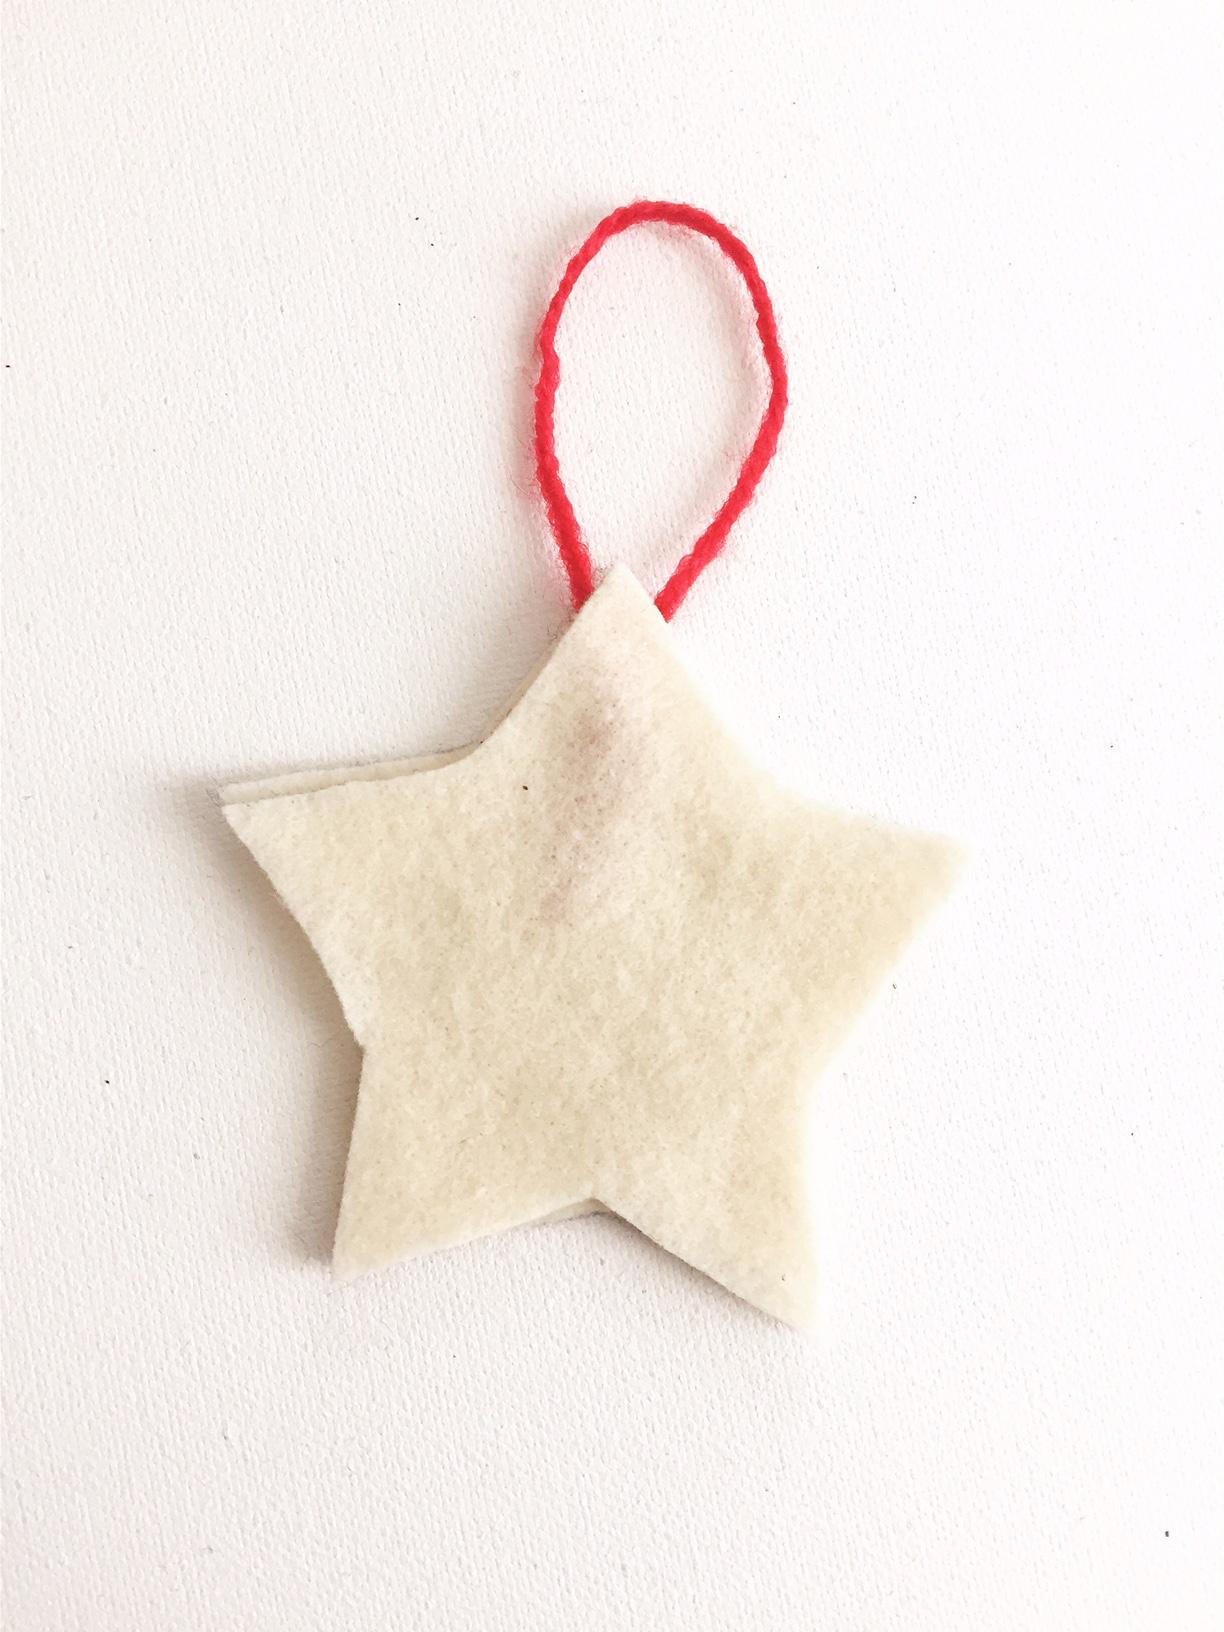 Handmade Fabric Ornament 5